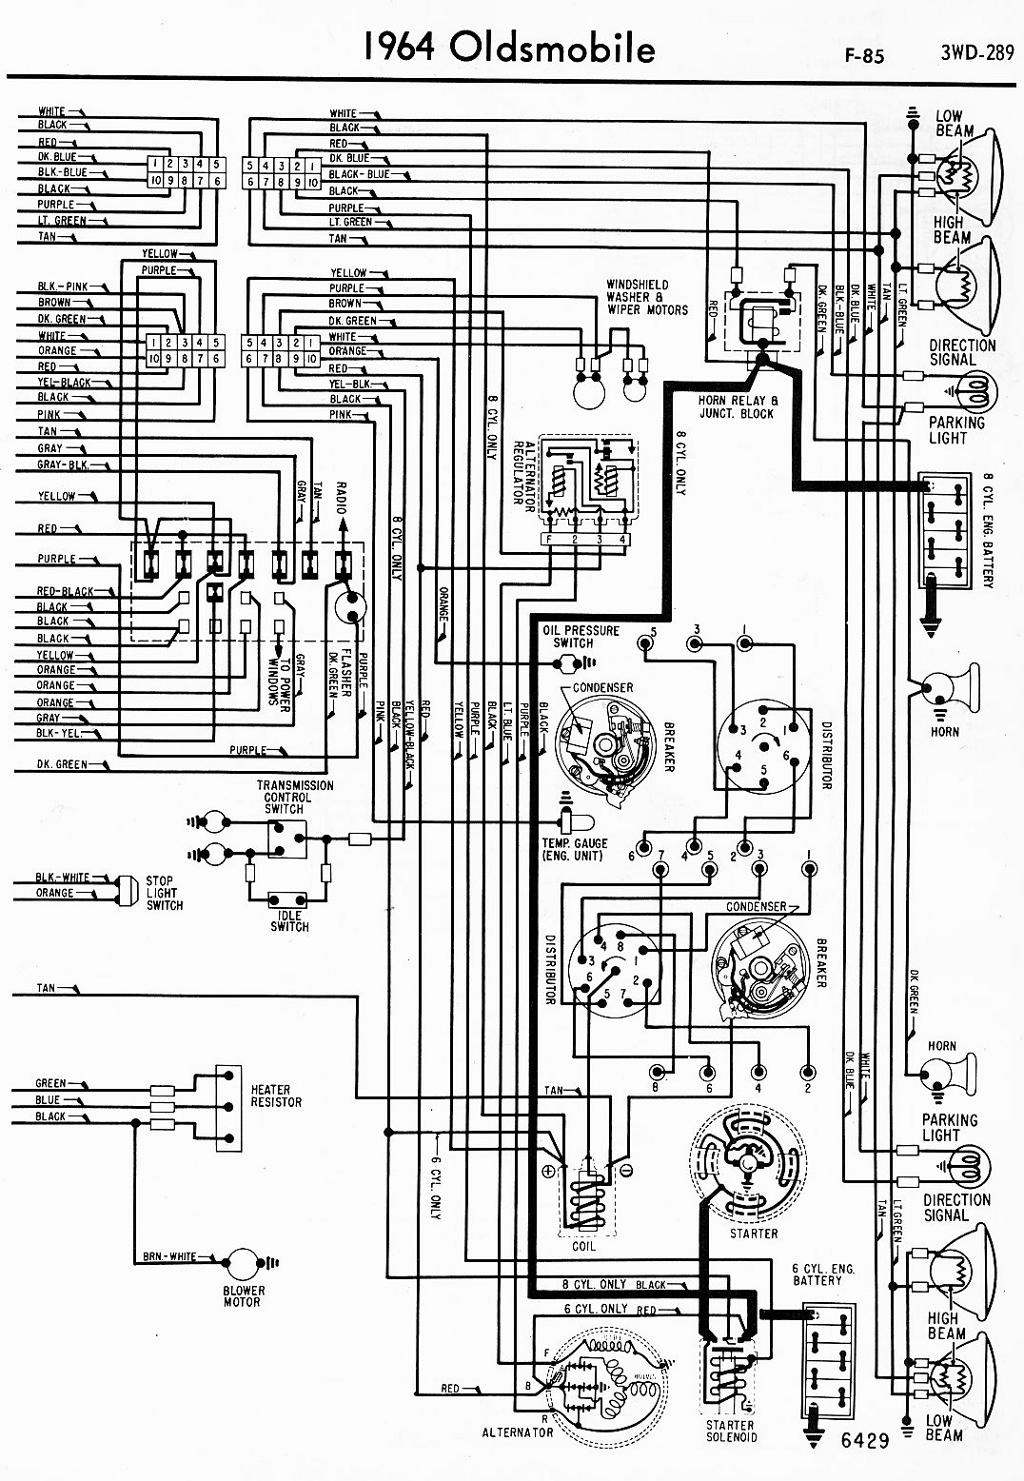 medium resolution of 1967 oldsmobile toronado wiring diagram wiring library rh 50 skriptoase de 1968 oldsmobile cutlass wiring